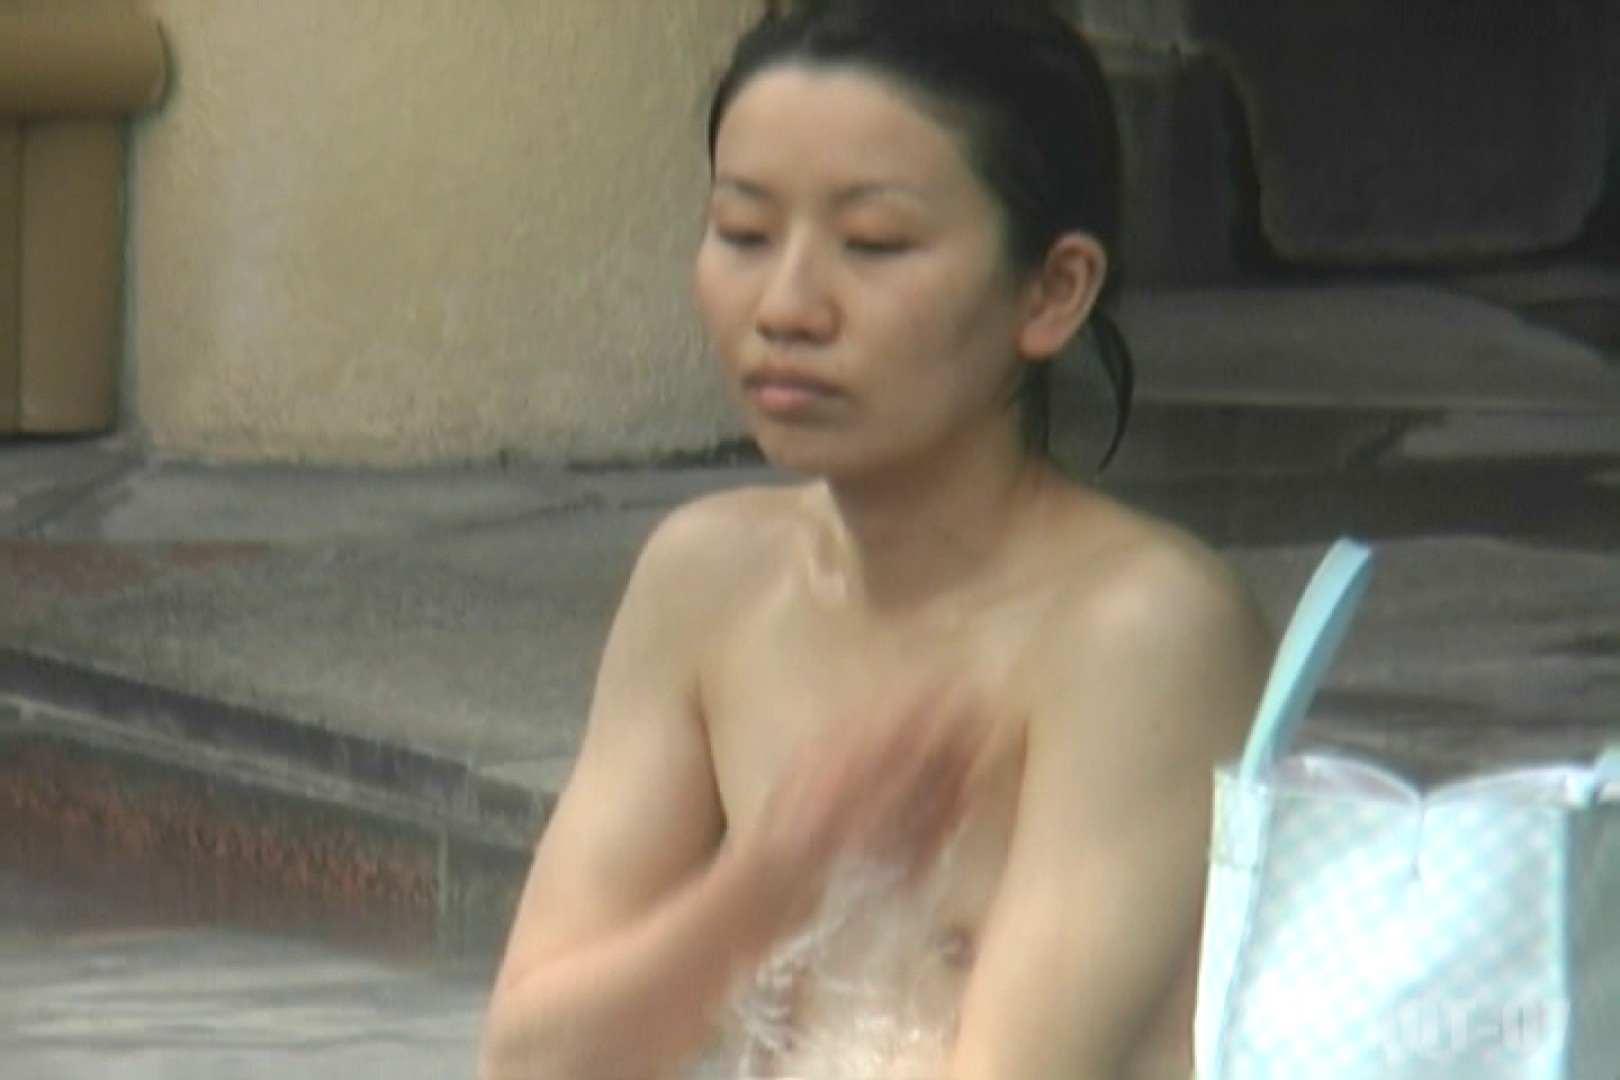 Aquaな露天風呂Vol.769 盗撮シリーズ | 露天風呂編  109PIX 39